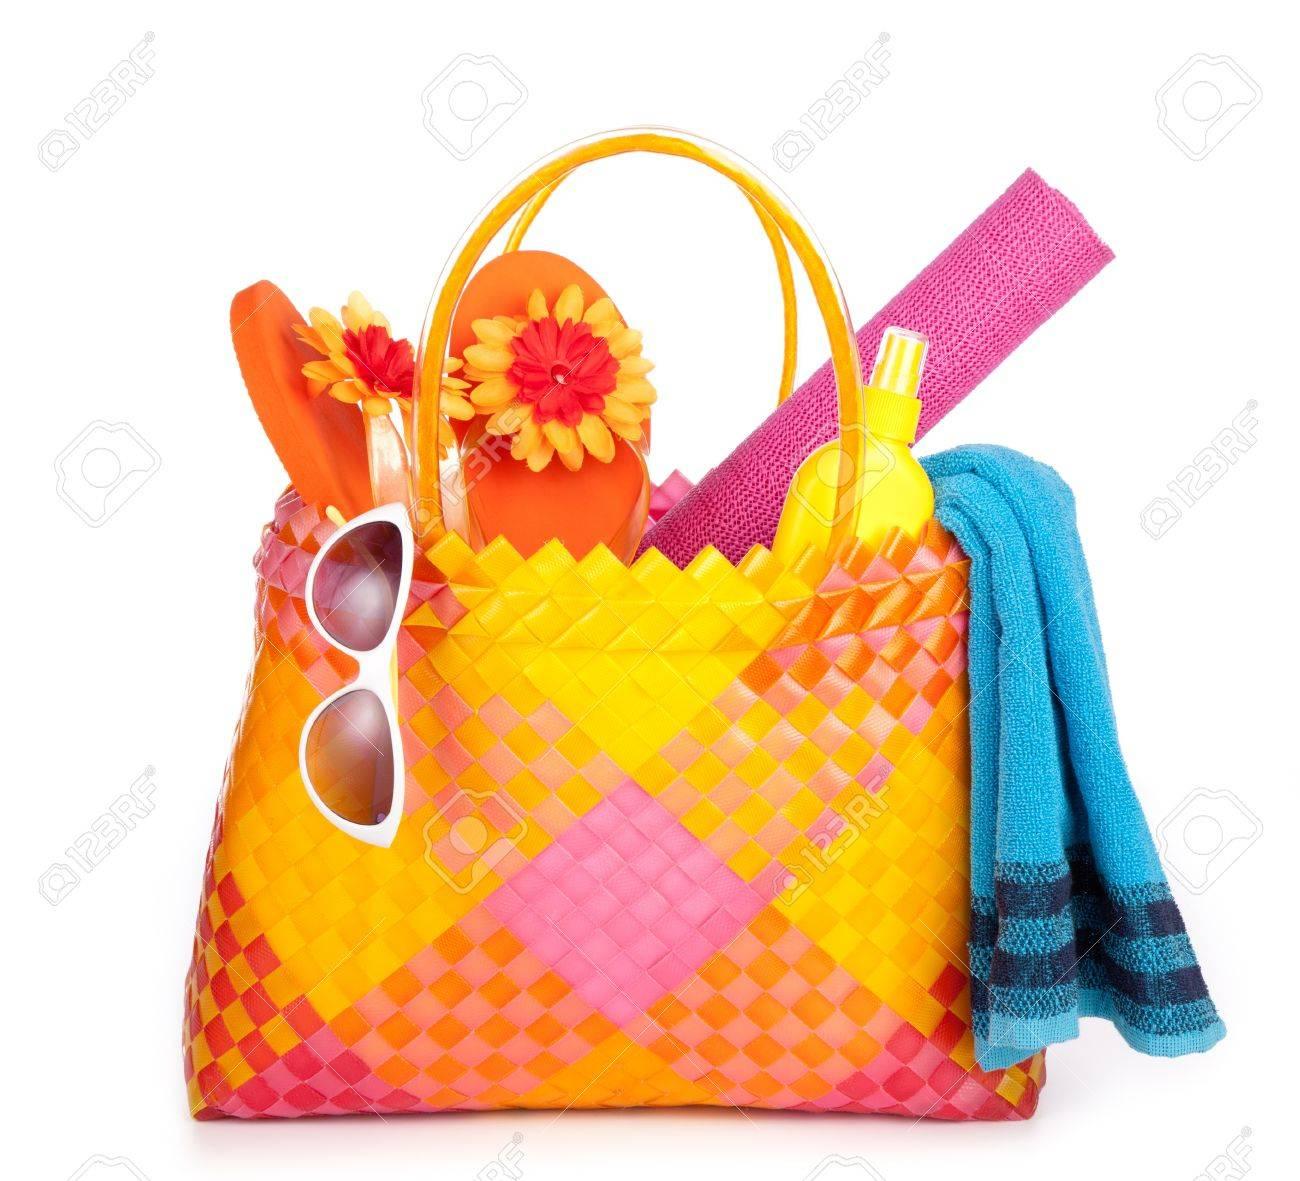 beach bag items Stock Photo - 9113845